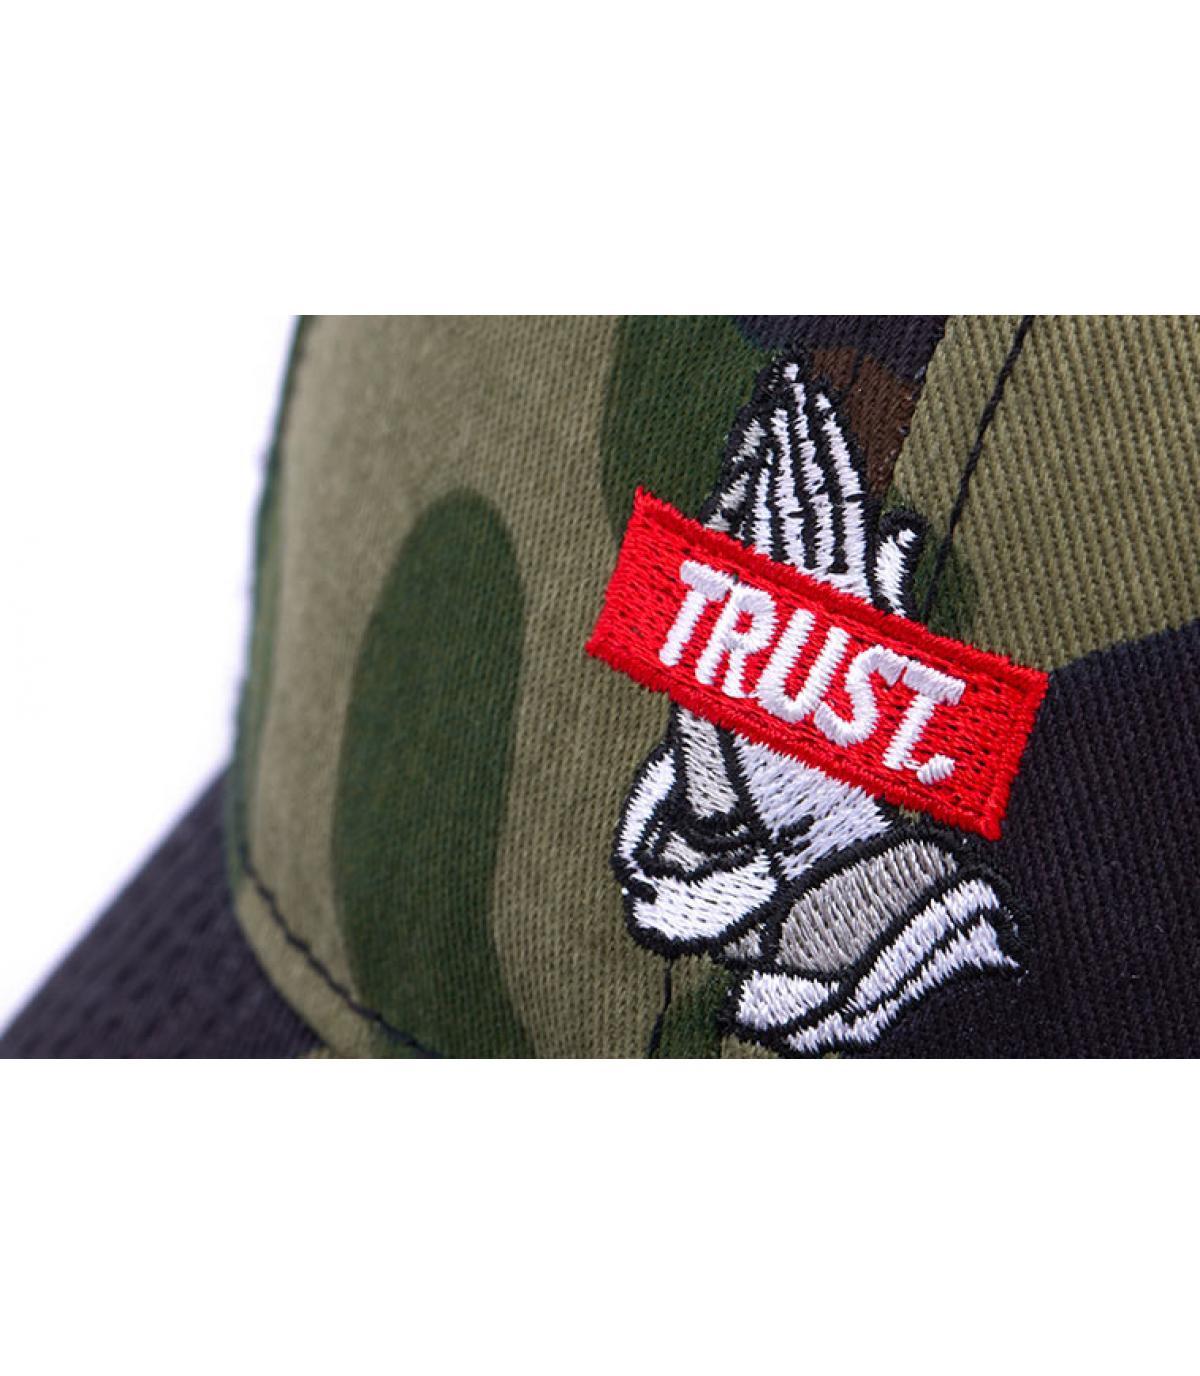 Dettagli Trust Curved Camo - image 5